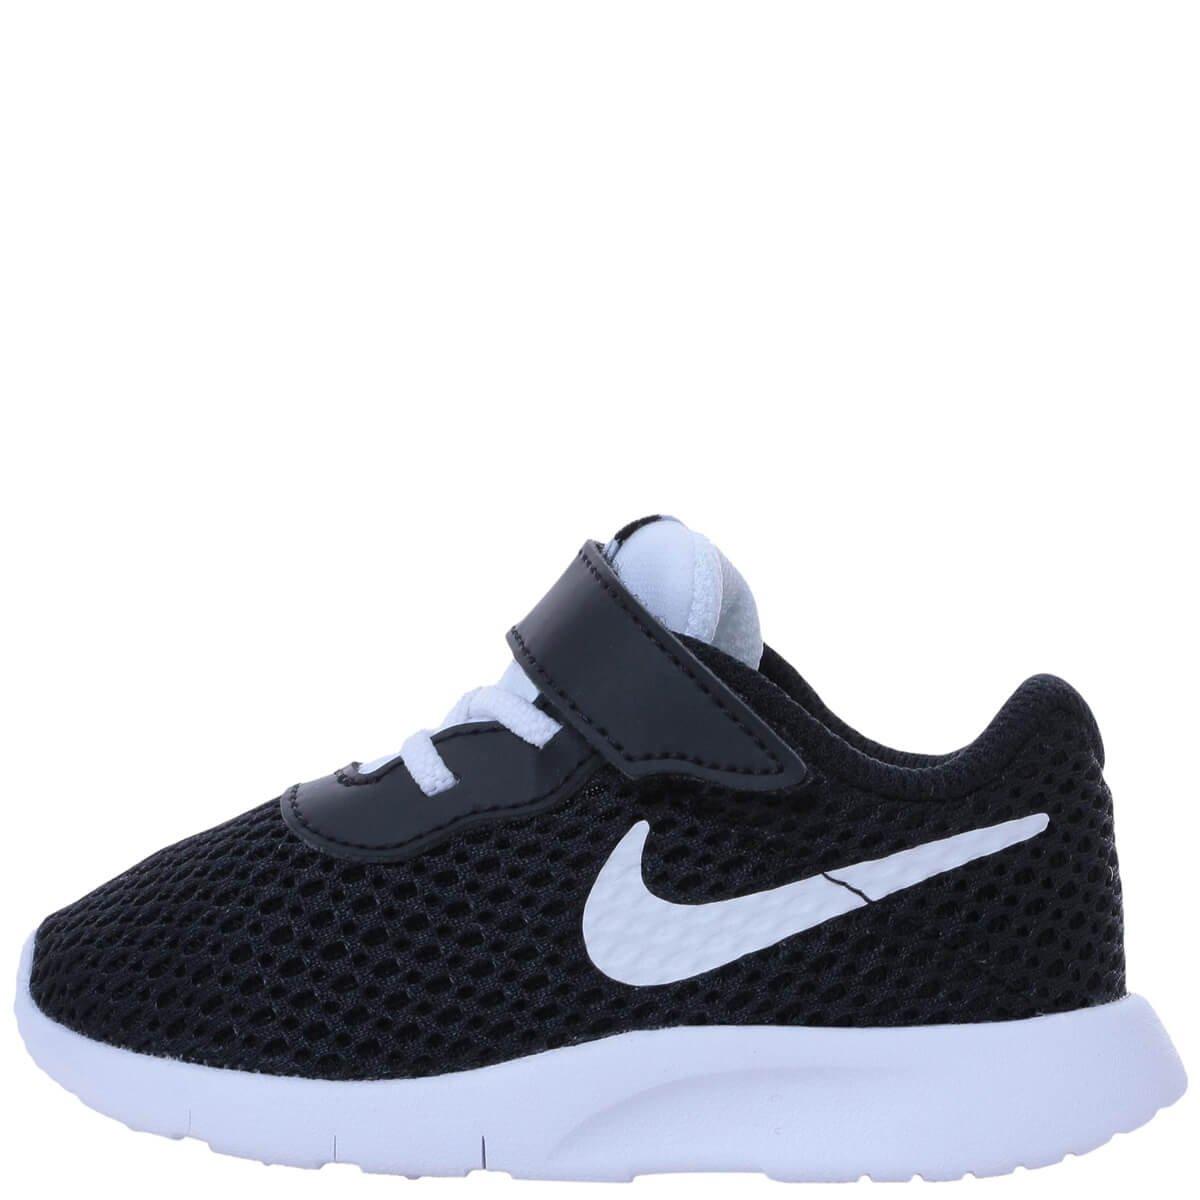 Bizz Store - Tênis Infantil Menino Nike Tanjun c06ace11df1f2